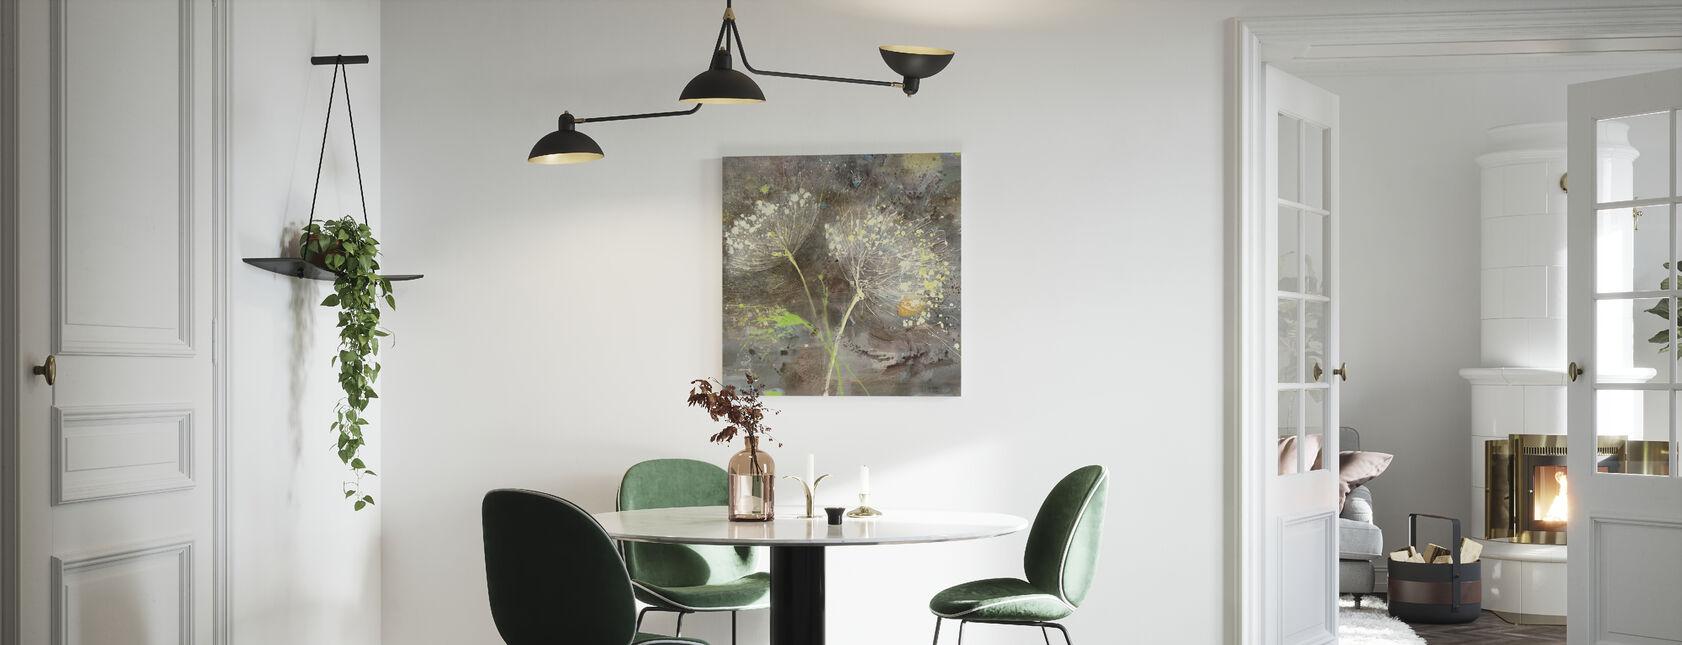 Sparklers 3 - Canvas print - Keuken